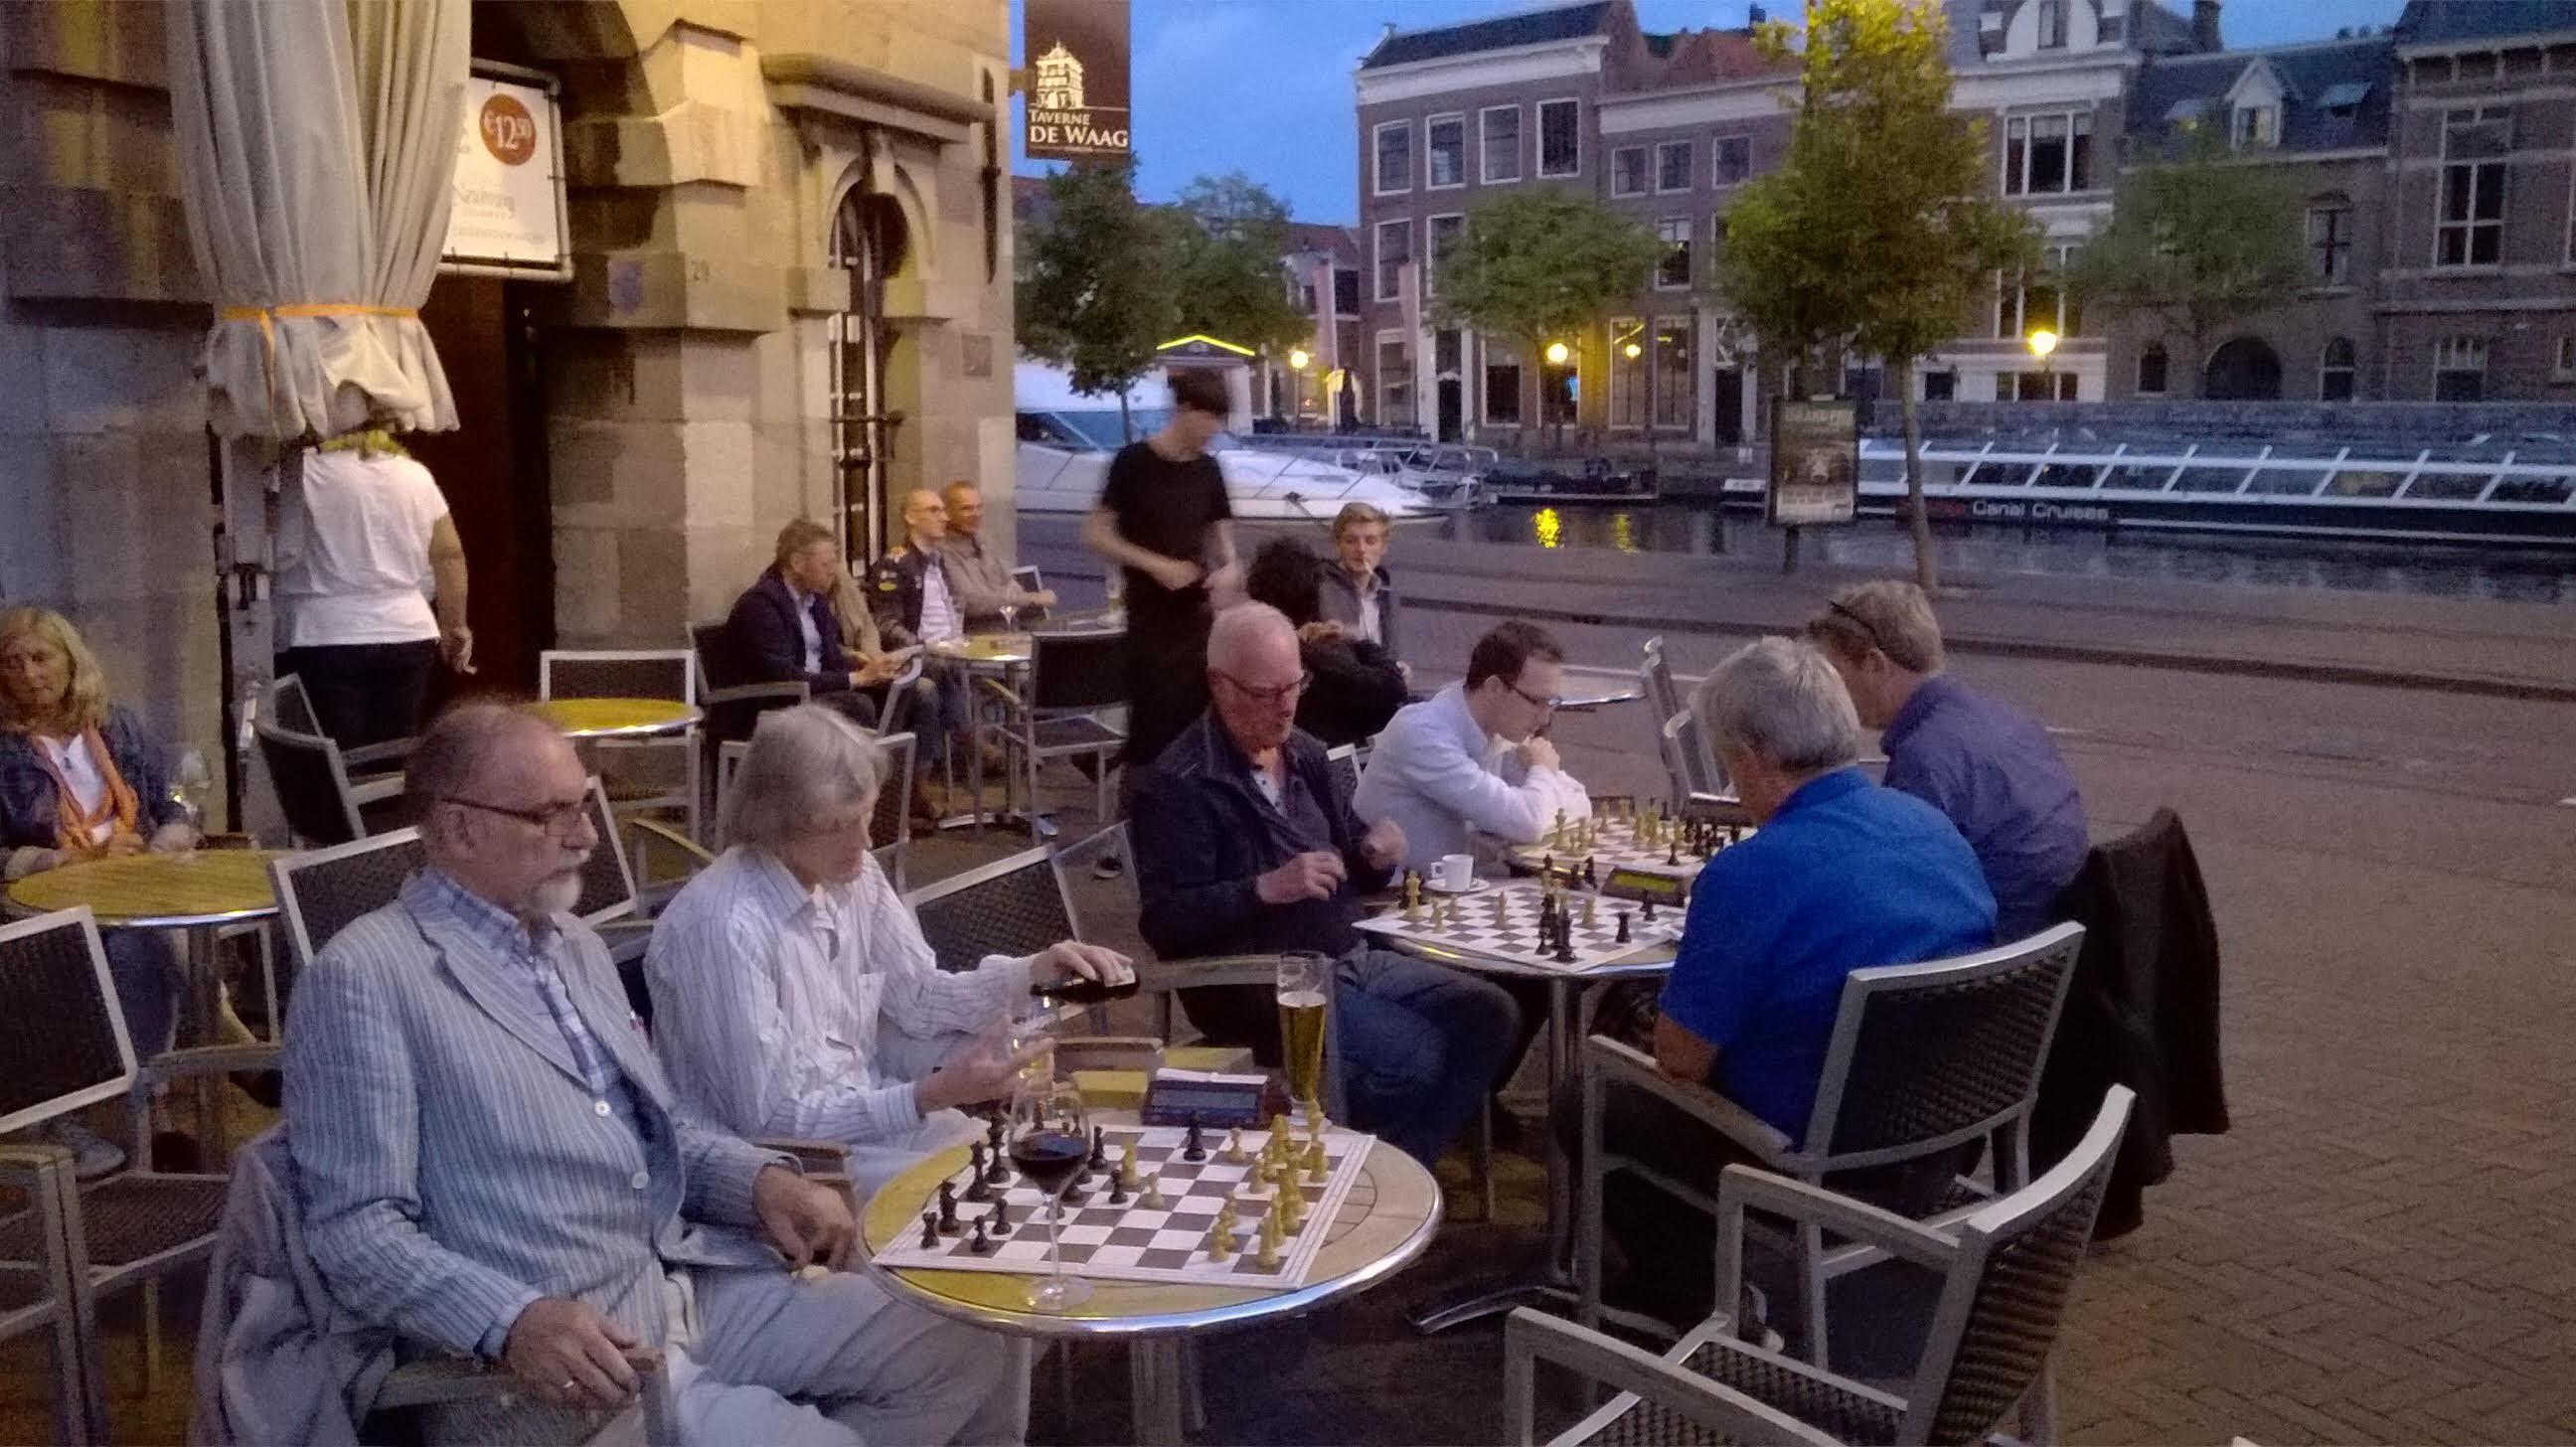 Zomerschaak in Taverne de Waag